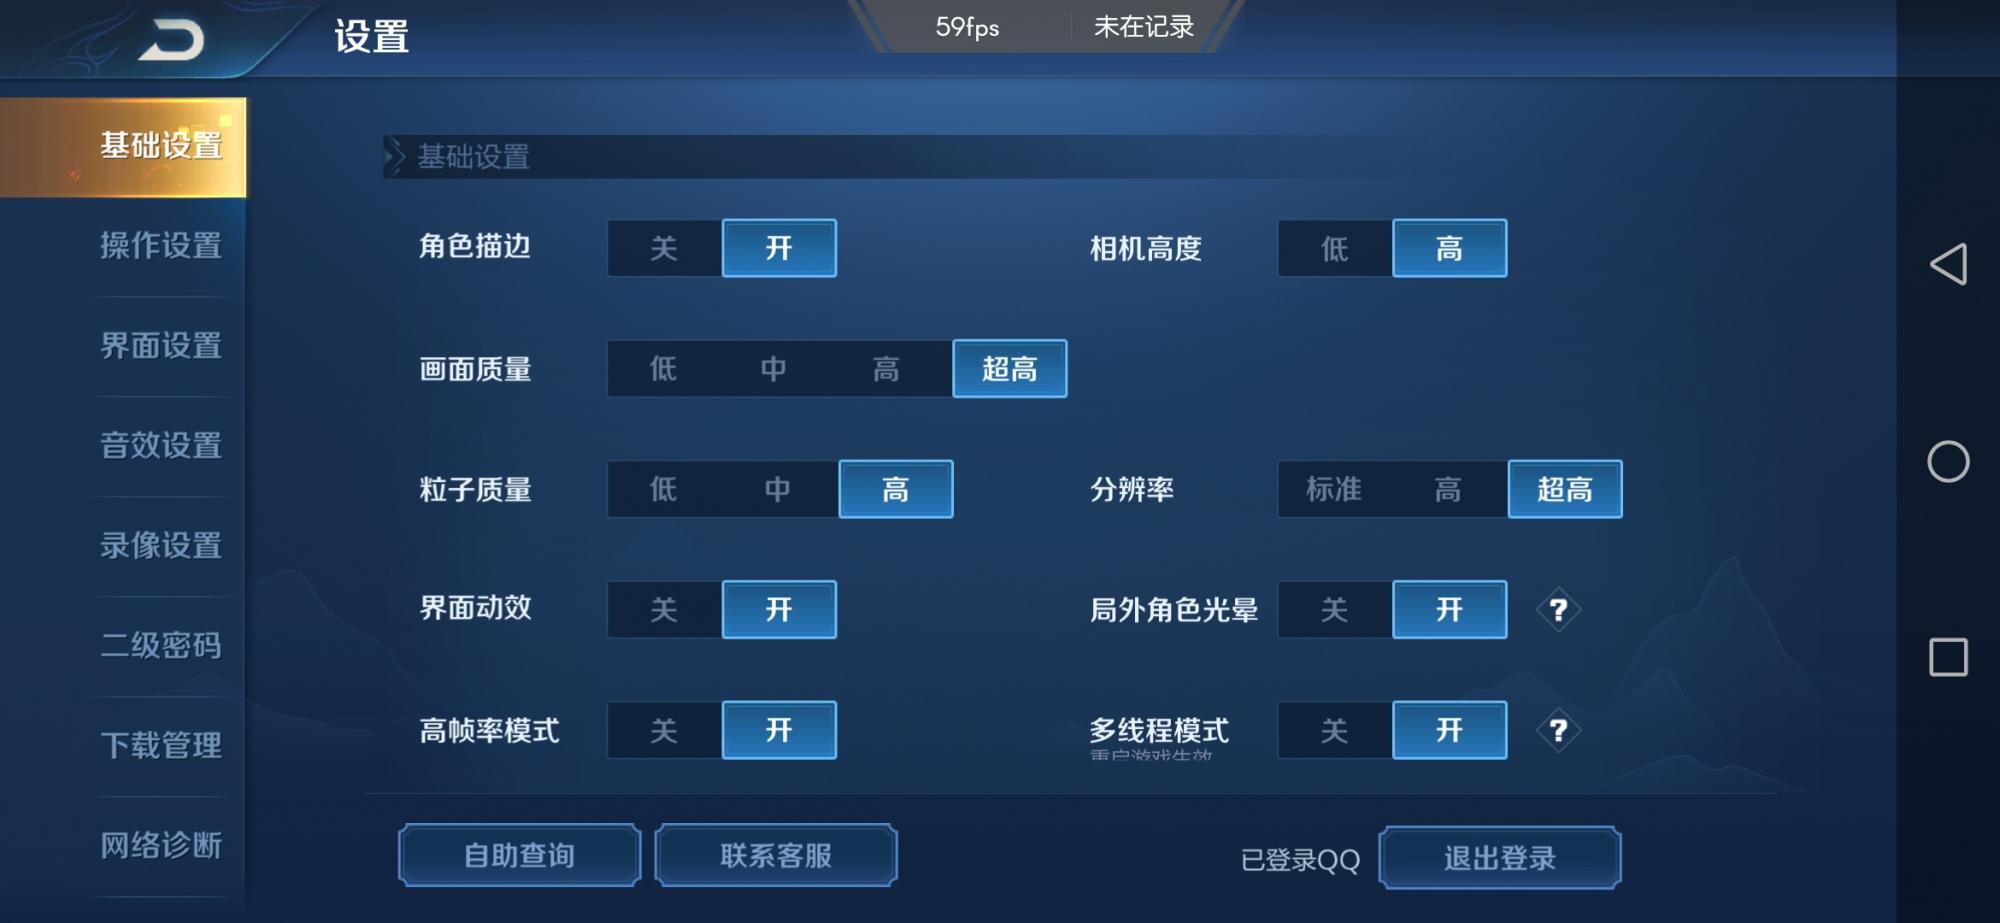 Screenshot_20190812_012257_com.tencent.tmgp.sgame.jpg